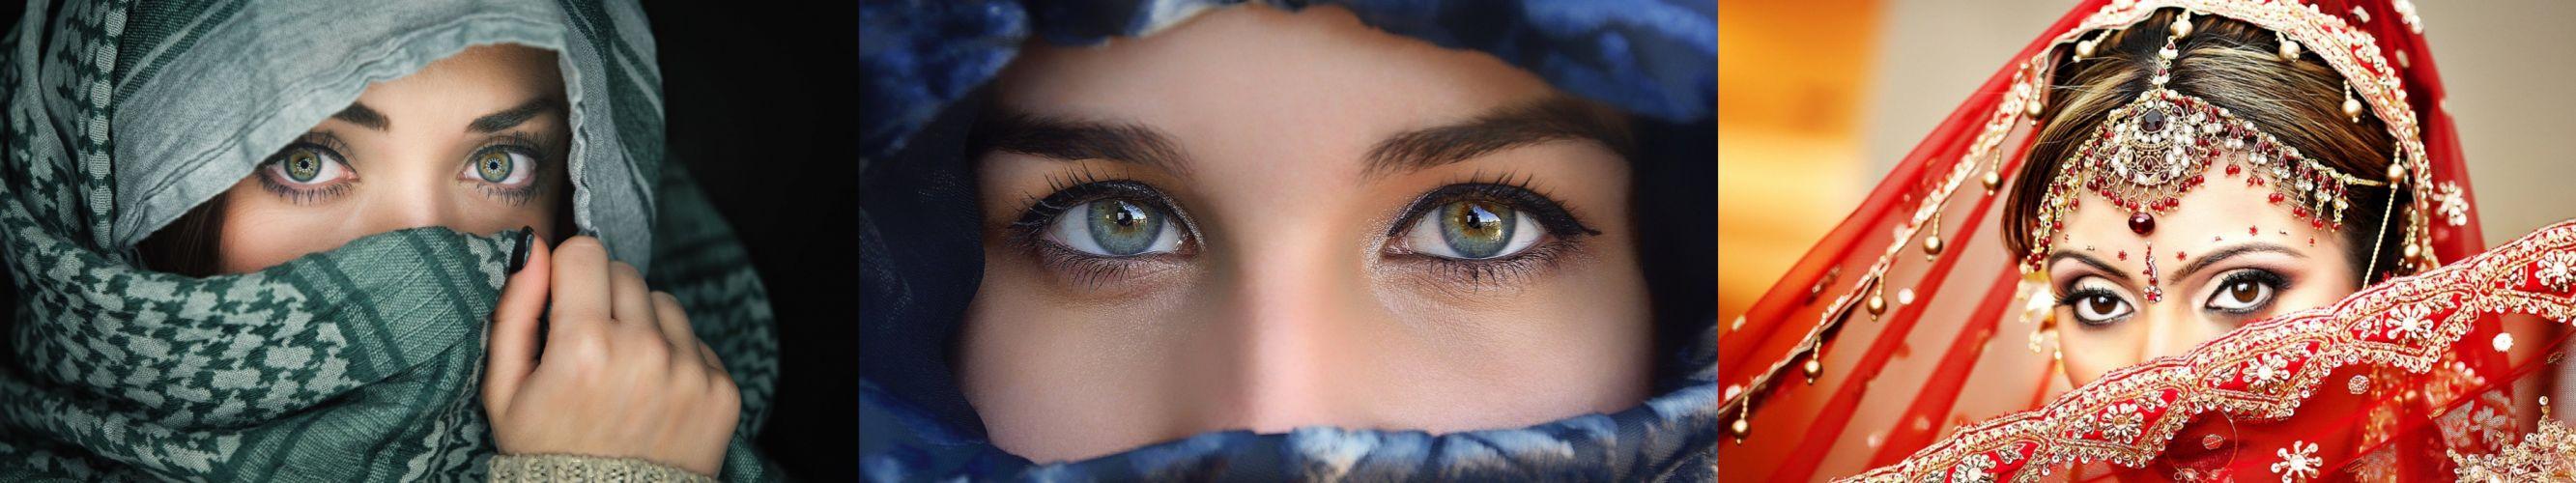 womens femme eyes yeux wallpaper